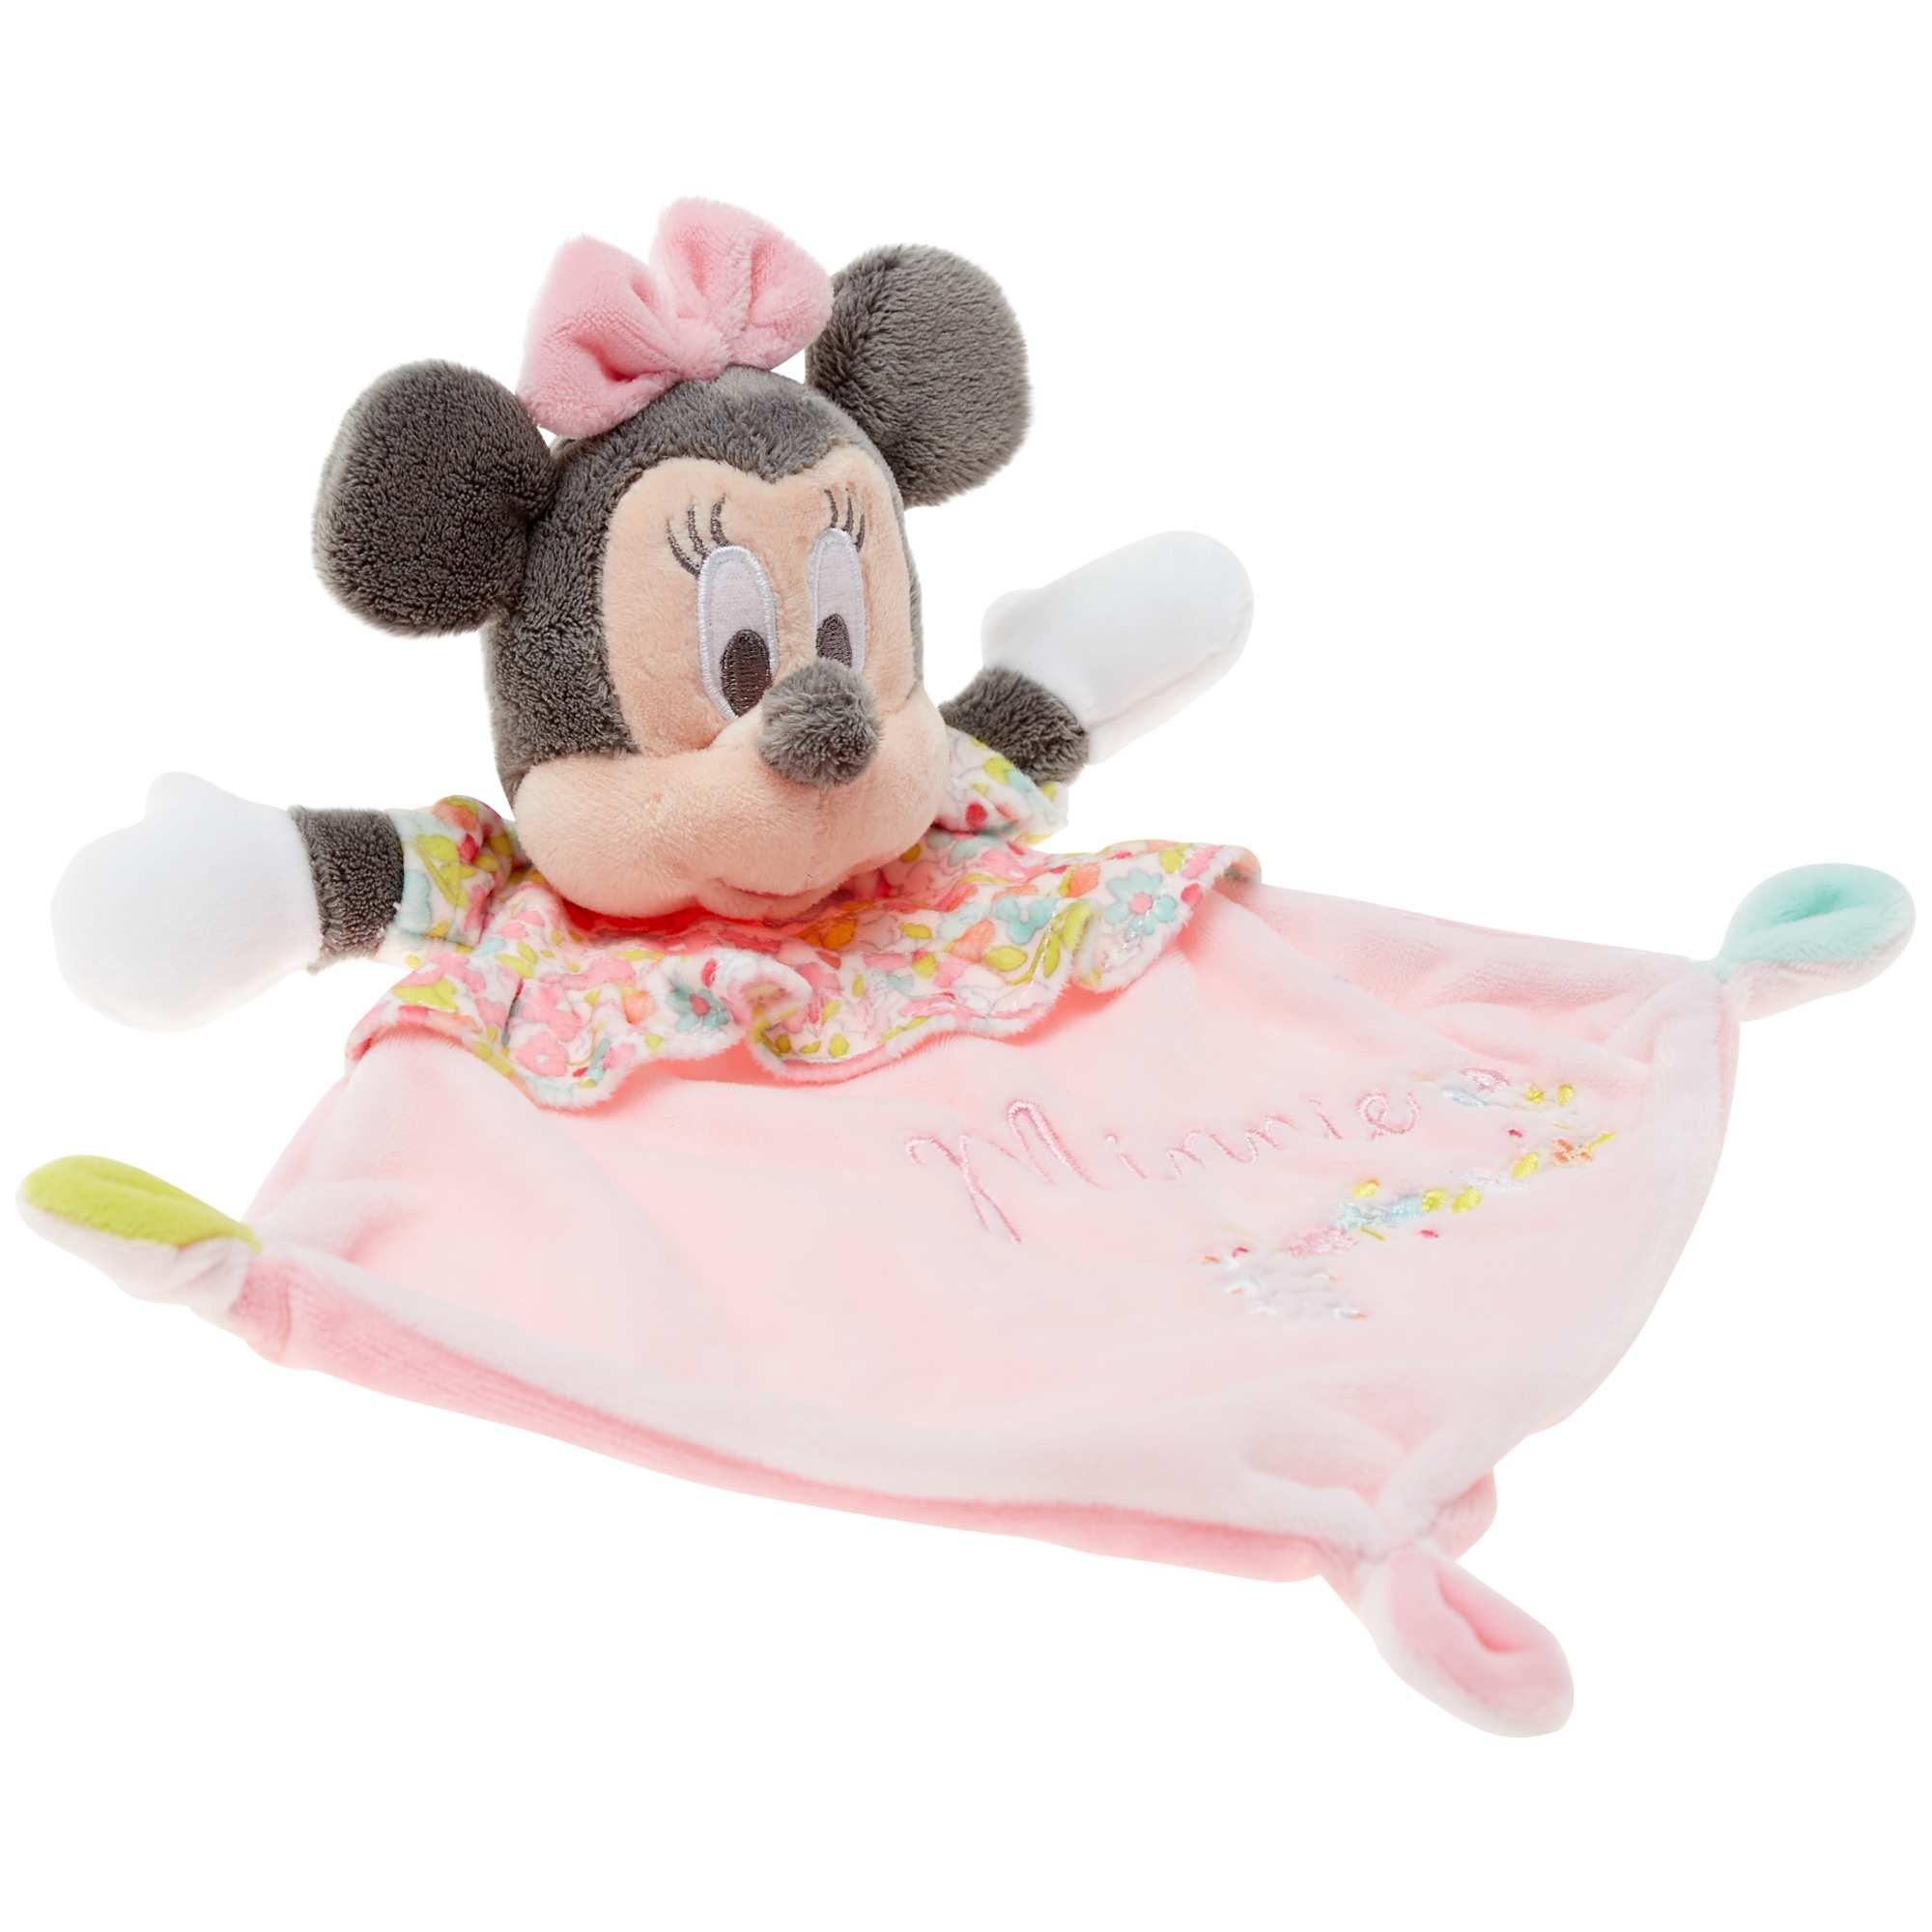 Doudou 39 minnie mouse 39 de 39 disney 39 b b fille rose kiabi 9 00 - Image minnie bebe ...